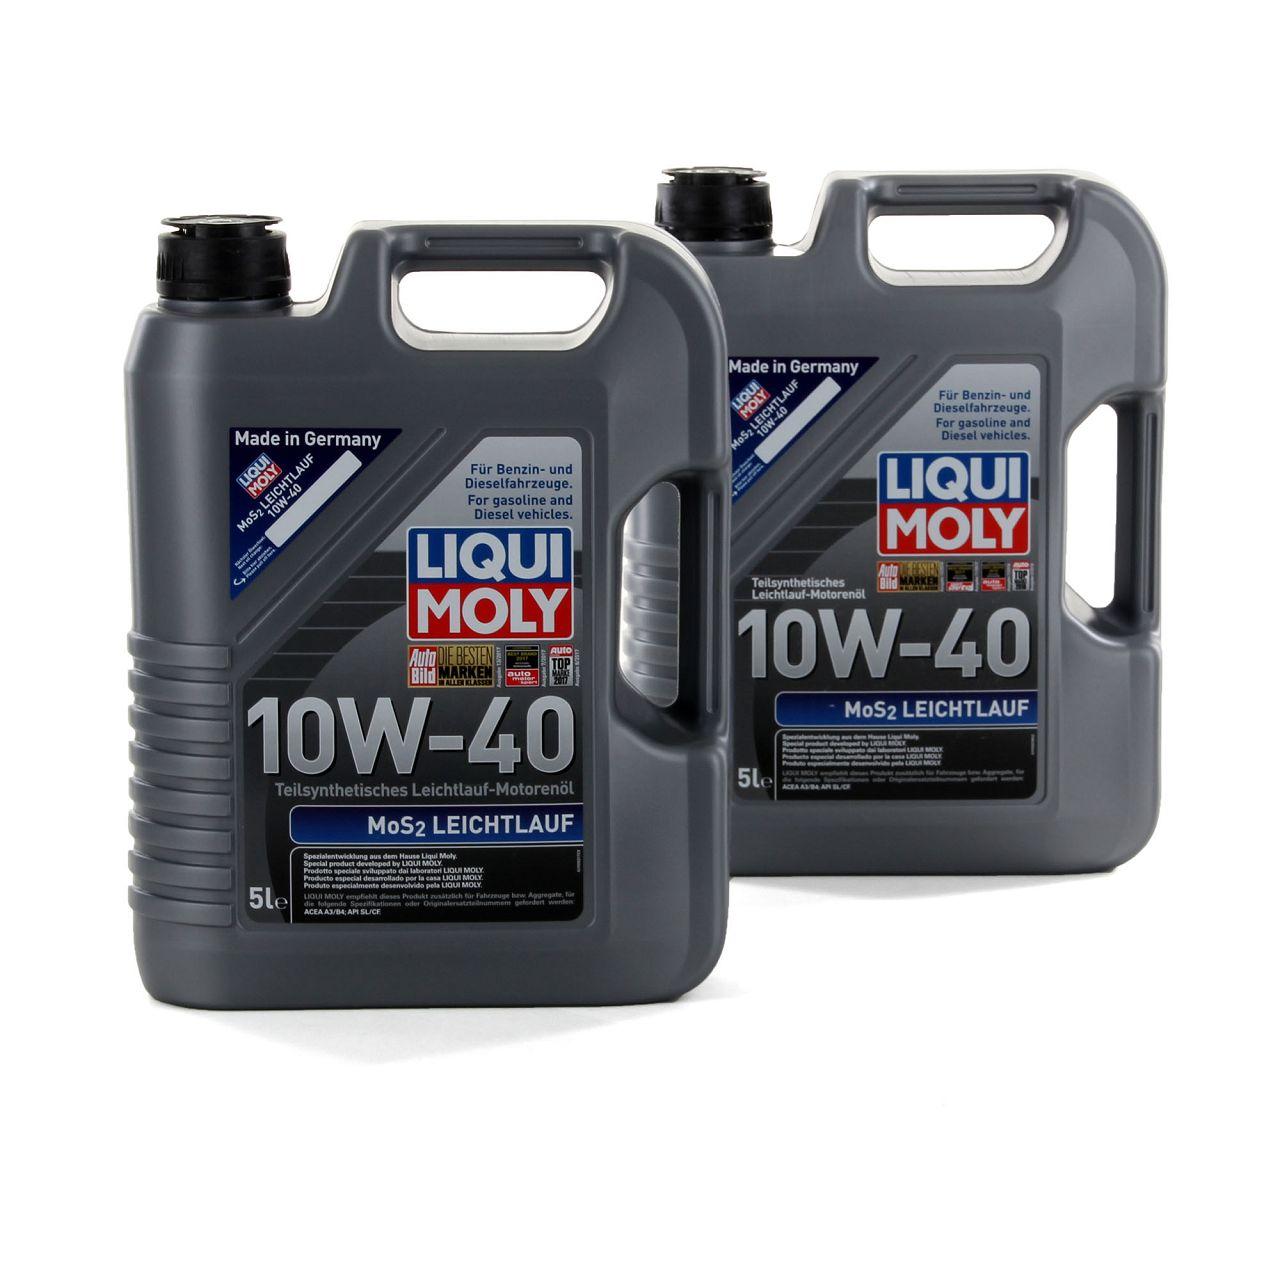 LIQUI MOLY Motoröl Öl MoS2 LEICHTLAUF 10W40 10W-40 10L 10 Liter 1092